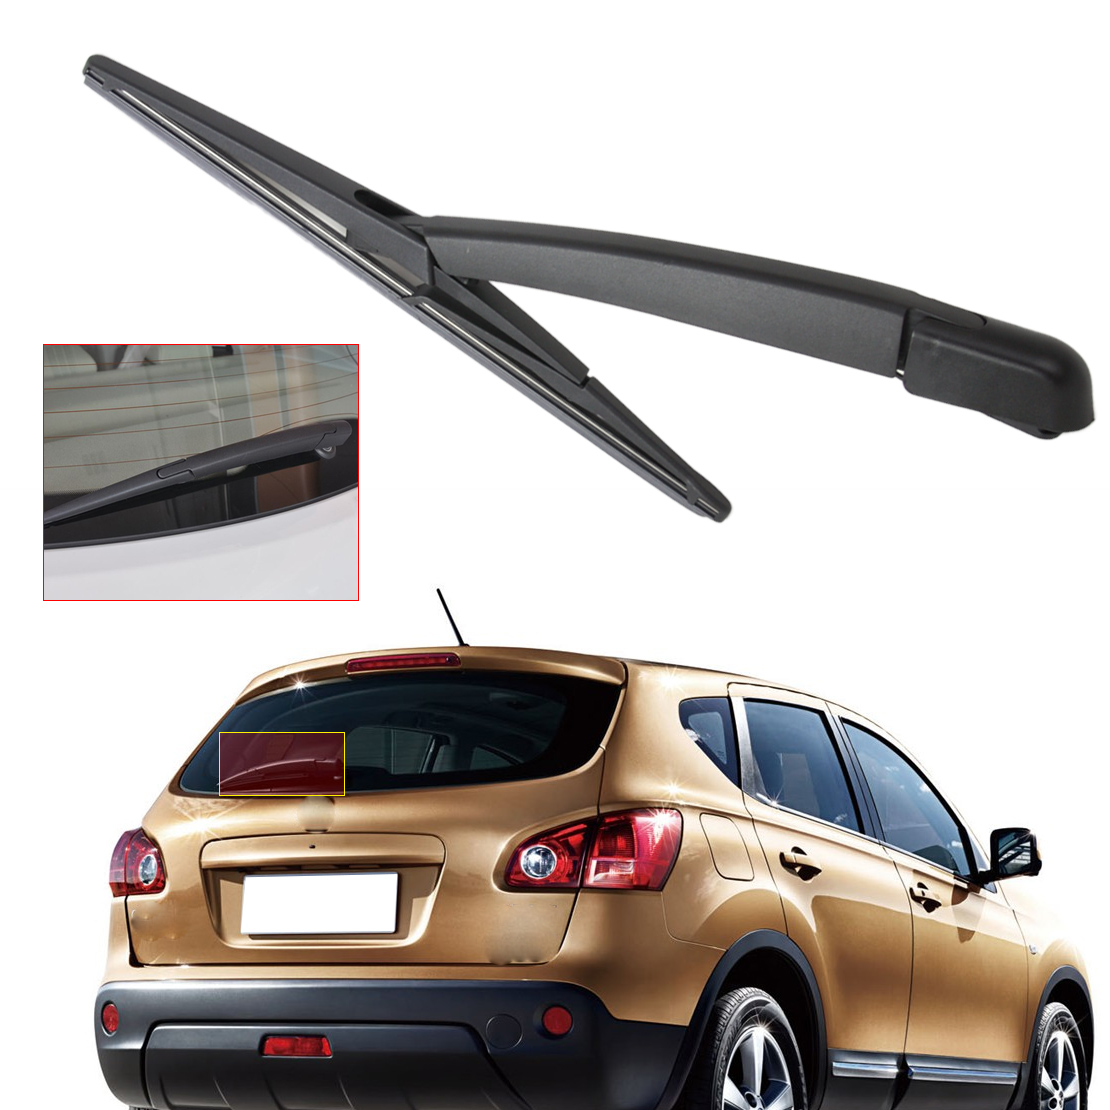 CITALL Car Rear Window Windshield Wiper Arm + Wiper Blade For Nissan Qashqai 2008 2009 2010 2011 2012 2013